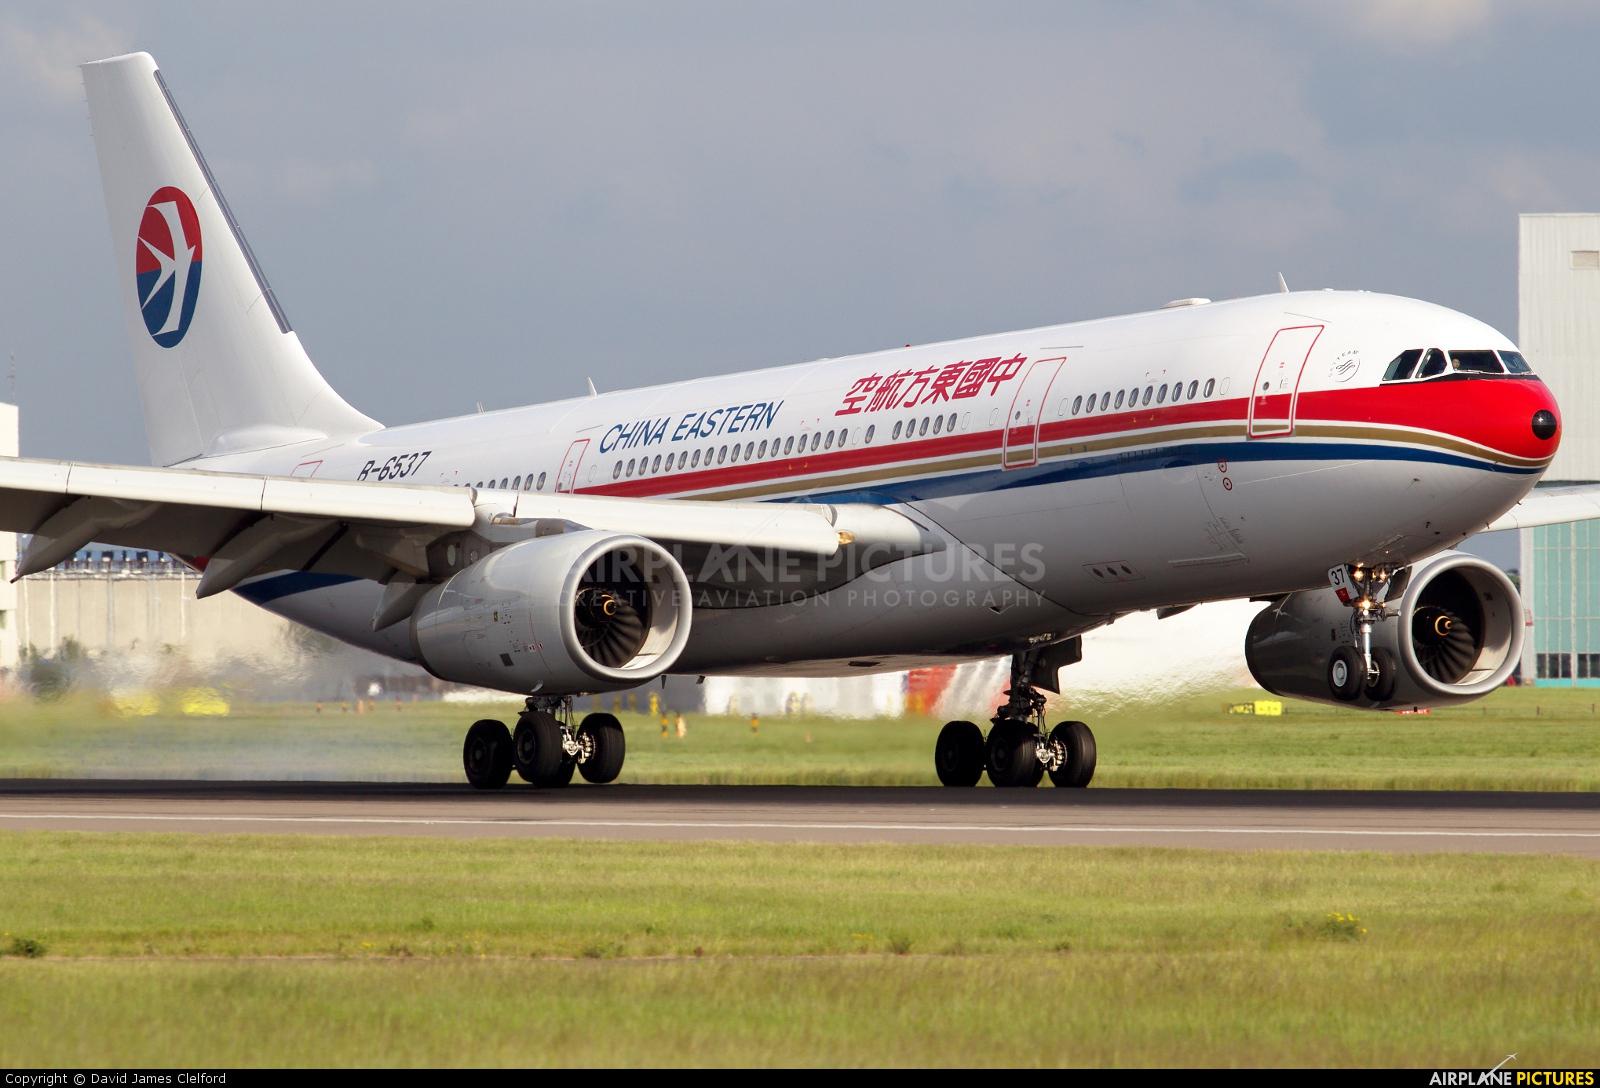 China Eastern Airlines B-6537 aircraft at London - Heathrow